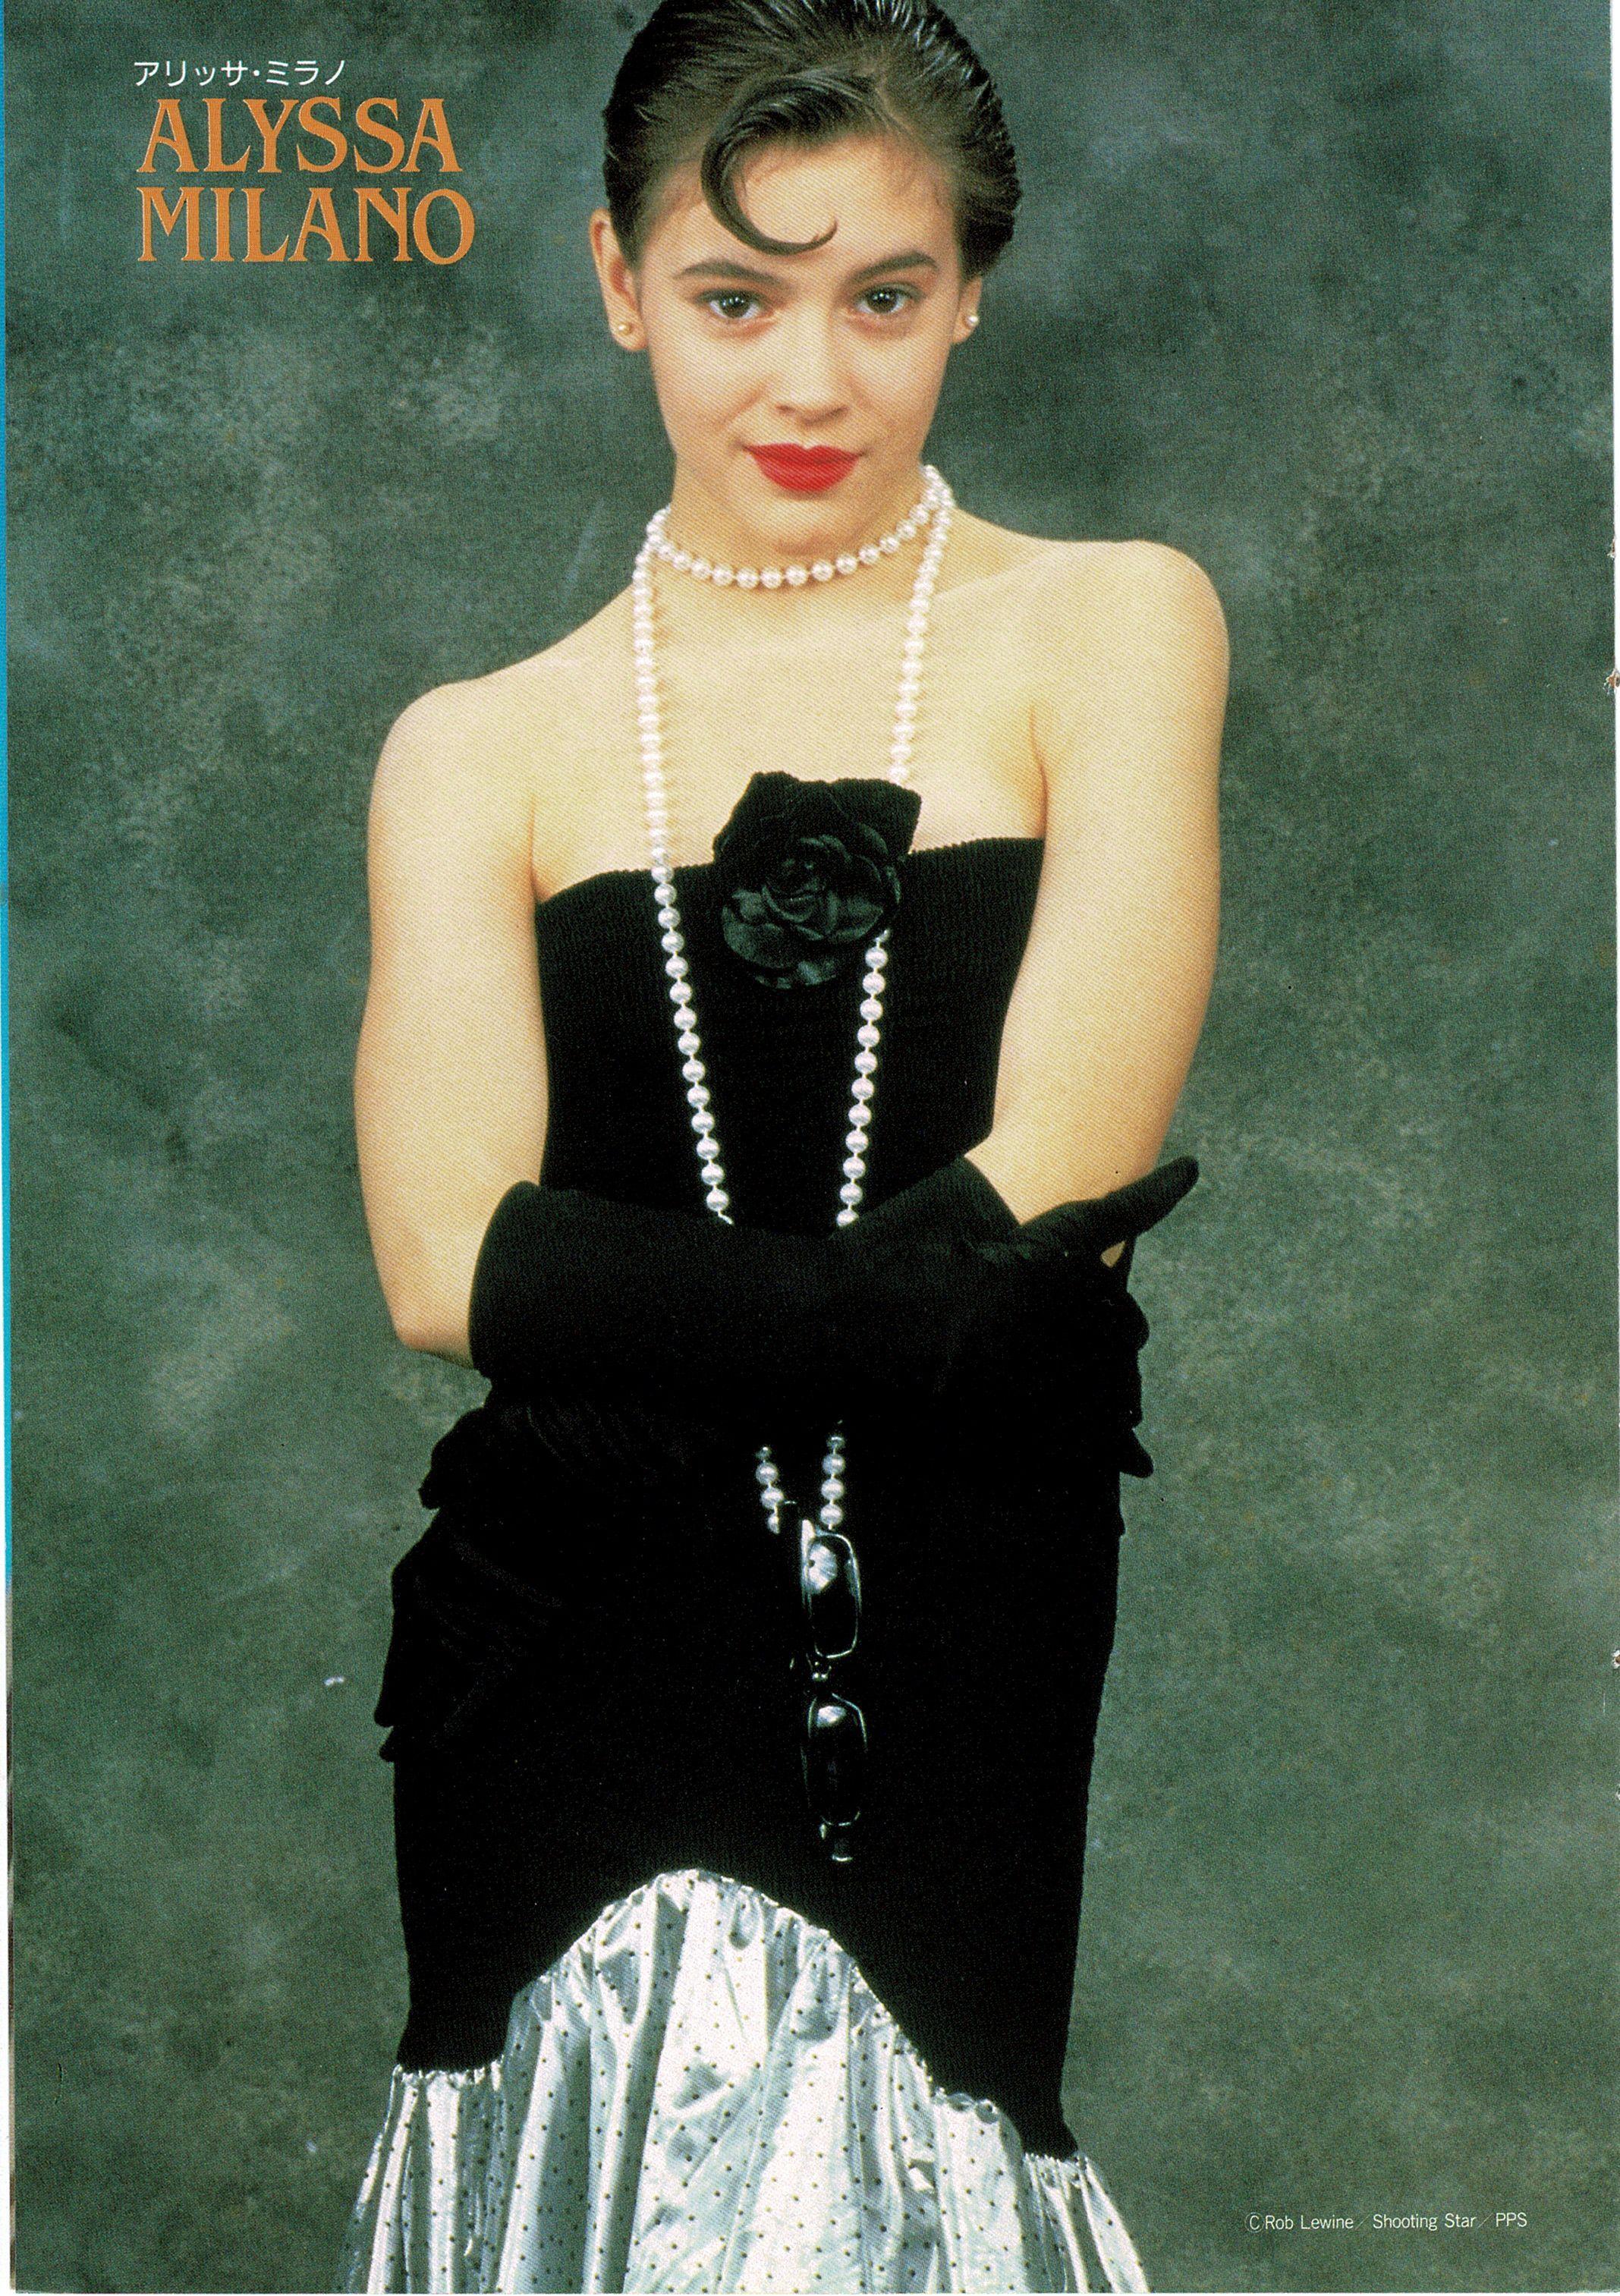 Alyssa Milano Poison Ivy 2 alyssa looking gorgeous in a black & silver evening gown